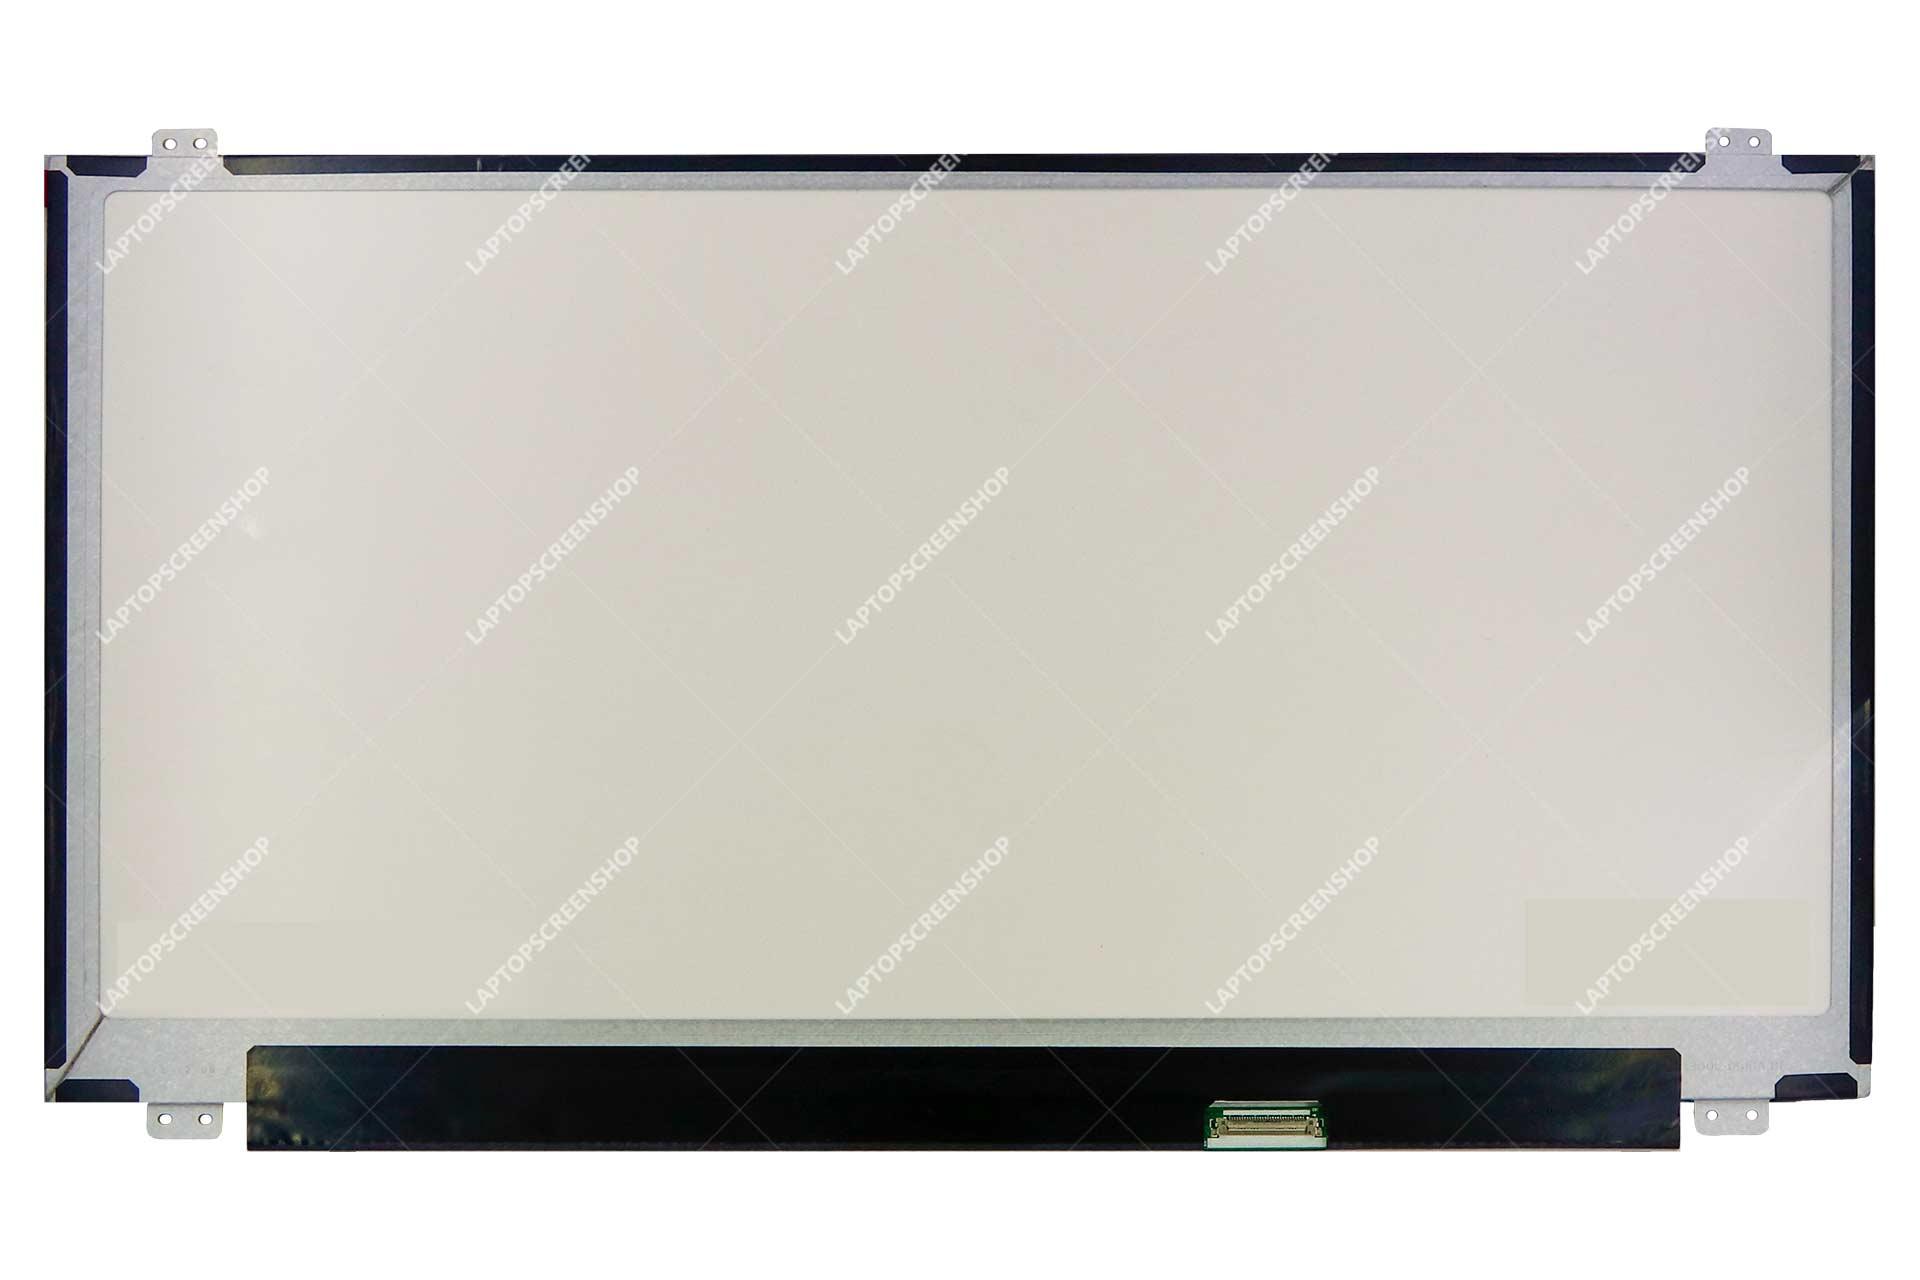 ACER-ASPIRE-E1-410-28204G50MNKK-LCD-LCD |HD|فروشگاه لپ تاپ اسکرين | تعمير لپ تاپ